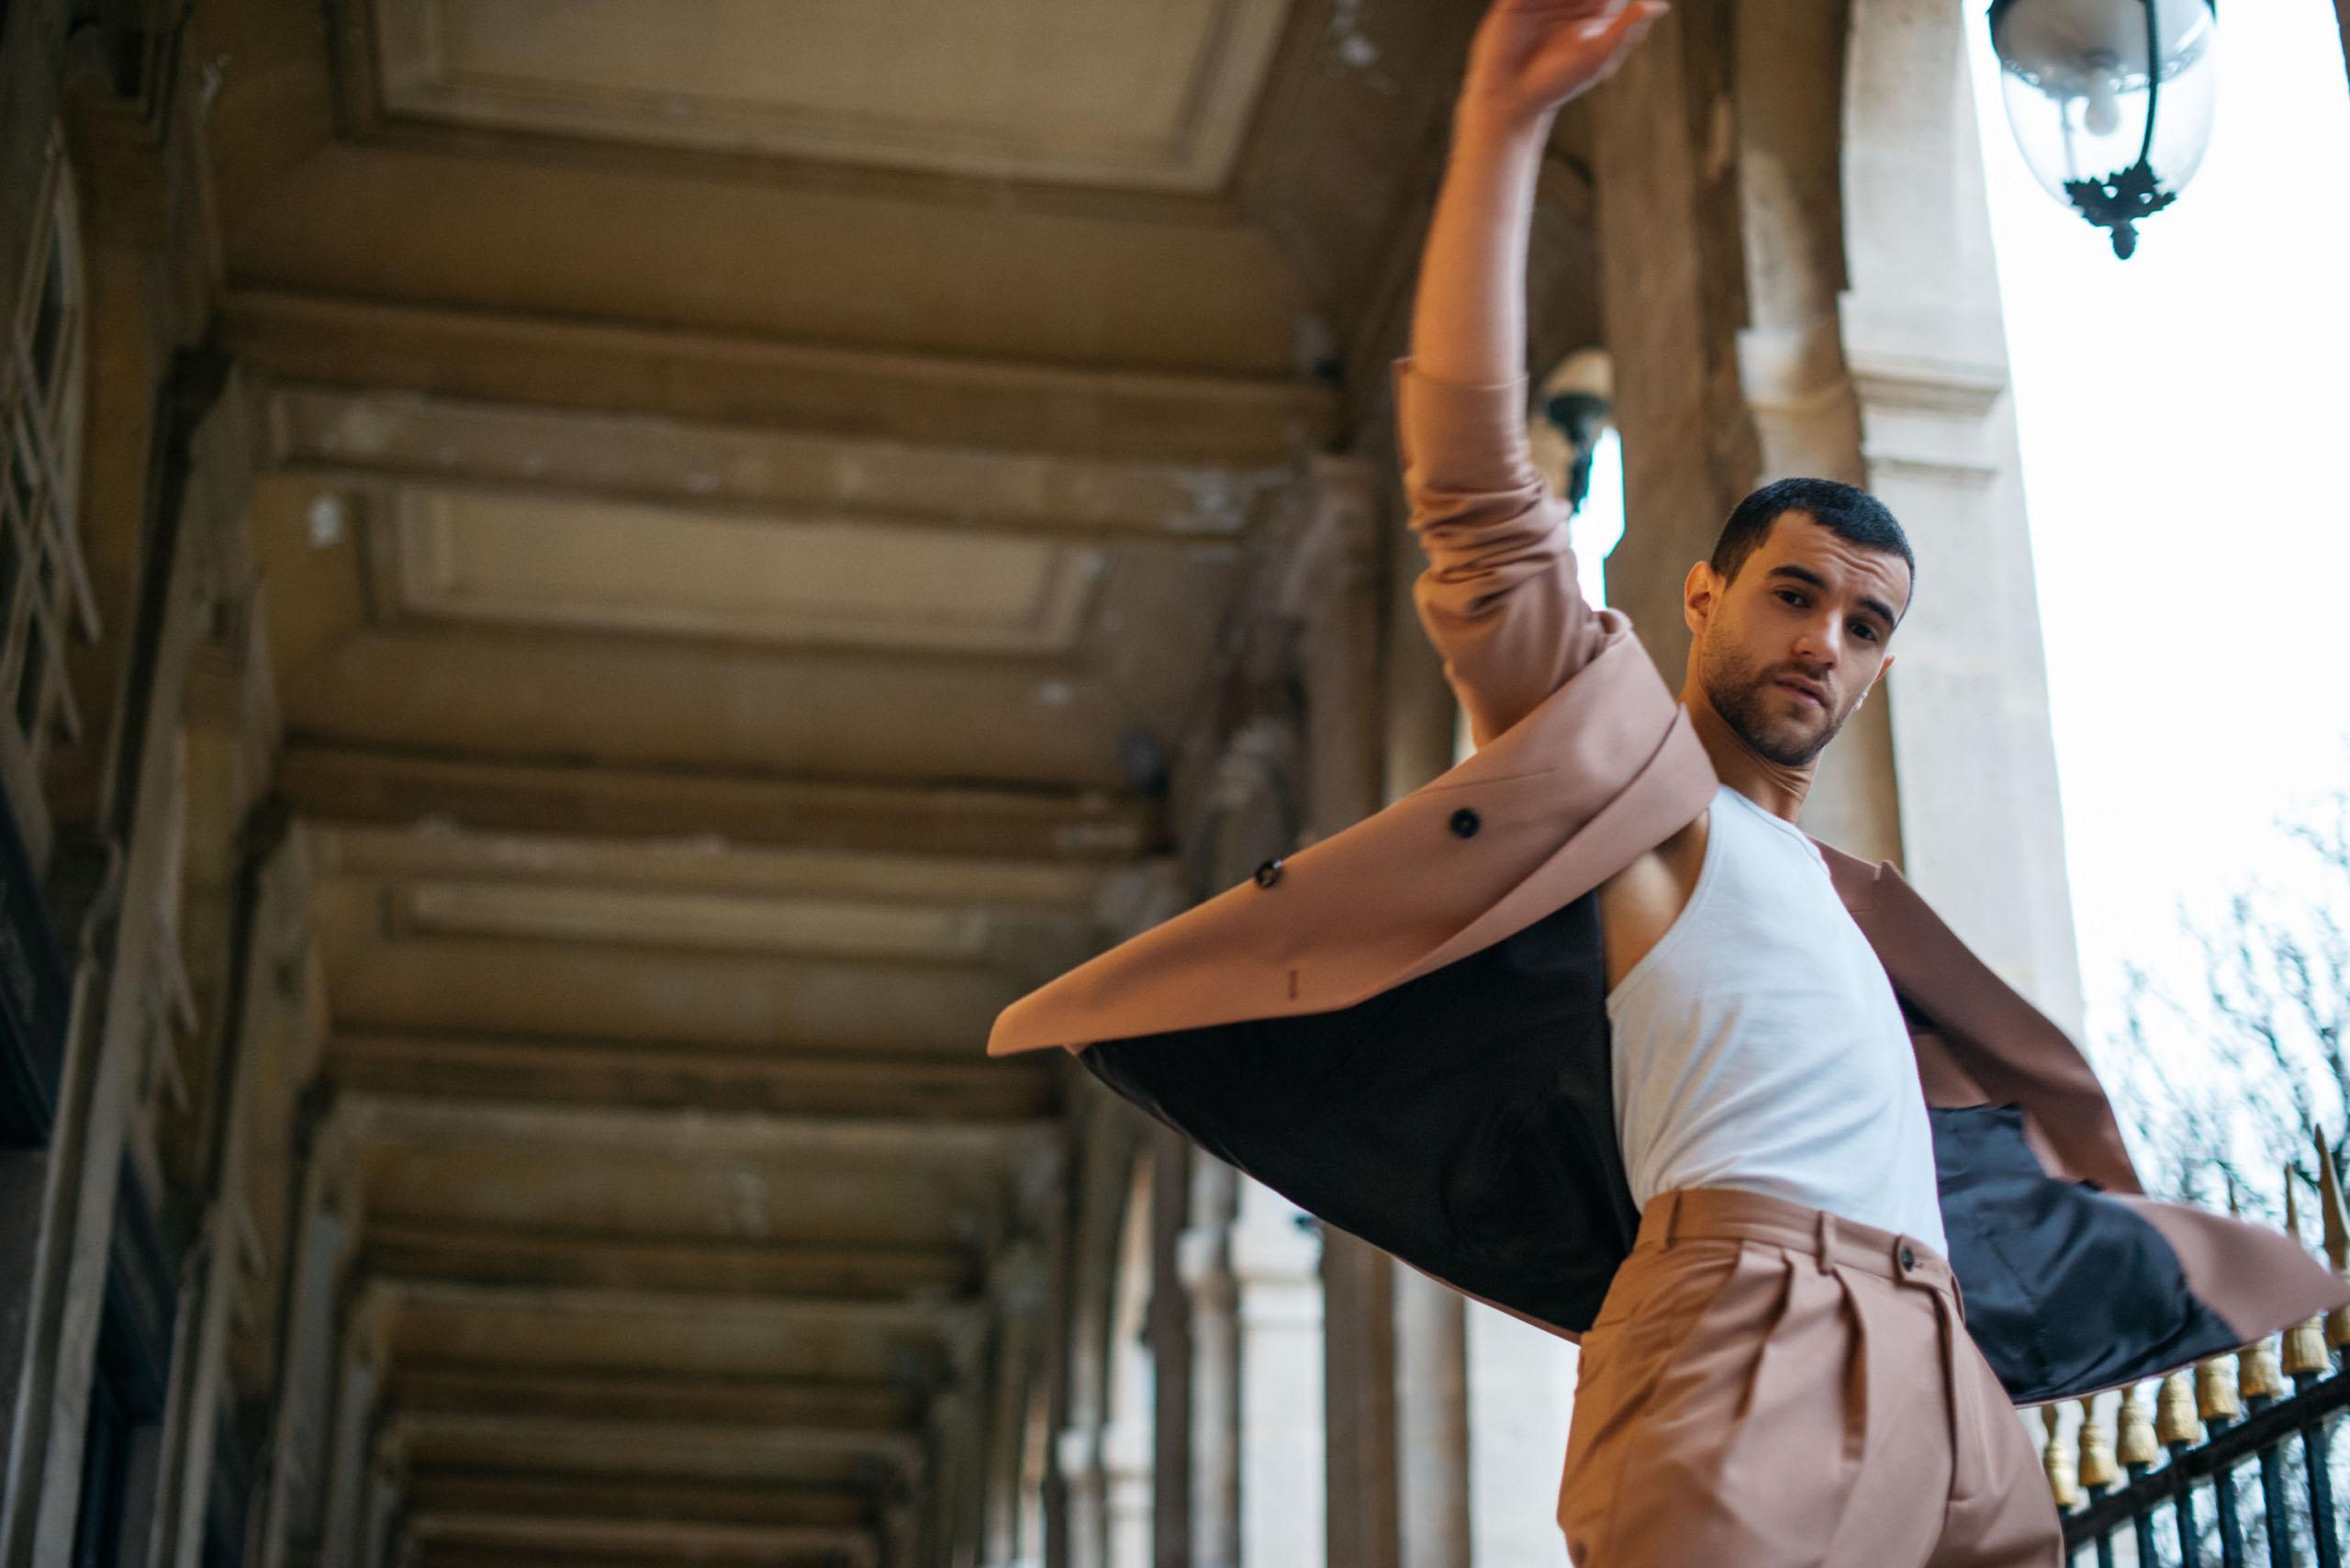 Andreas Geisen, between social and dance